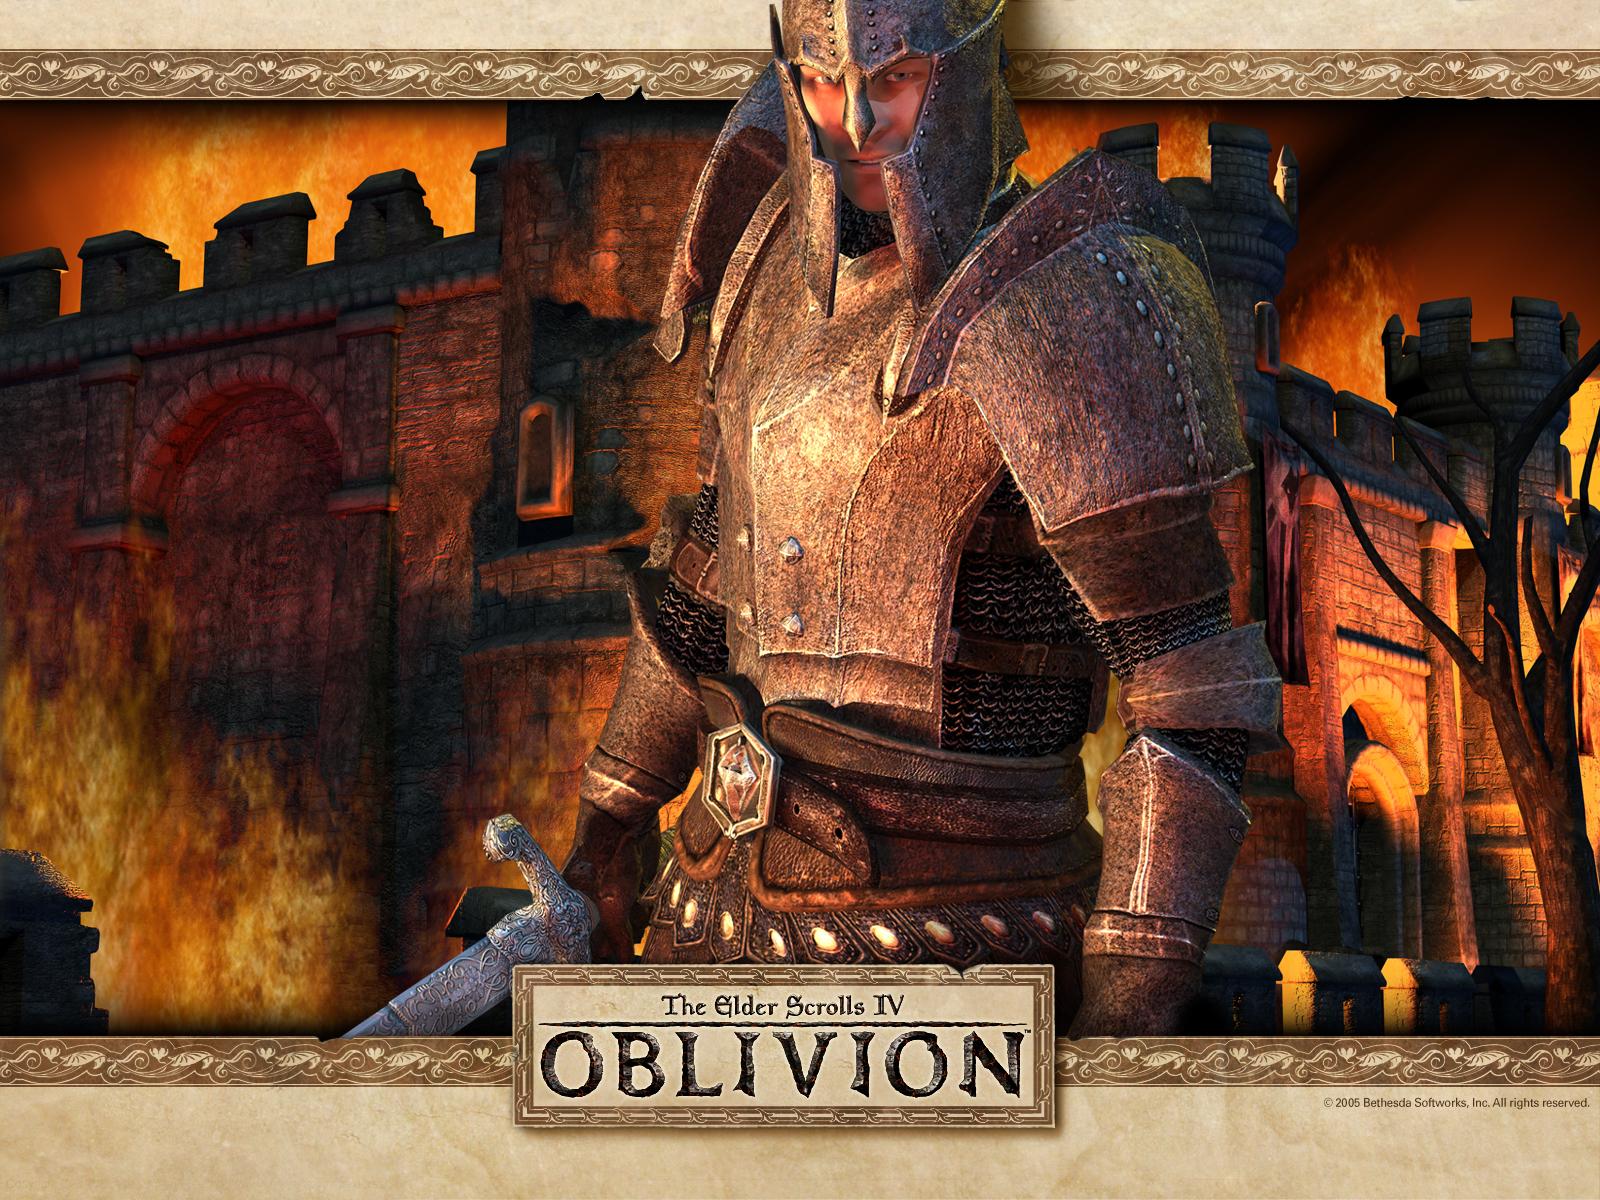 http://www.planetoblivion.de/Downloads/obliv_wallpaper3_1600.jpg